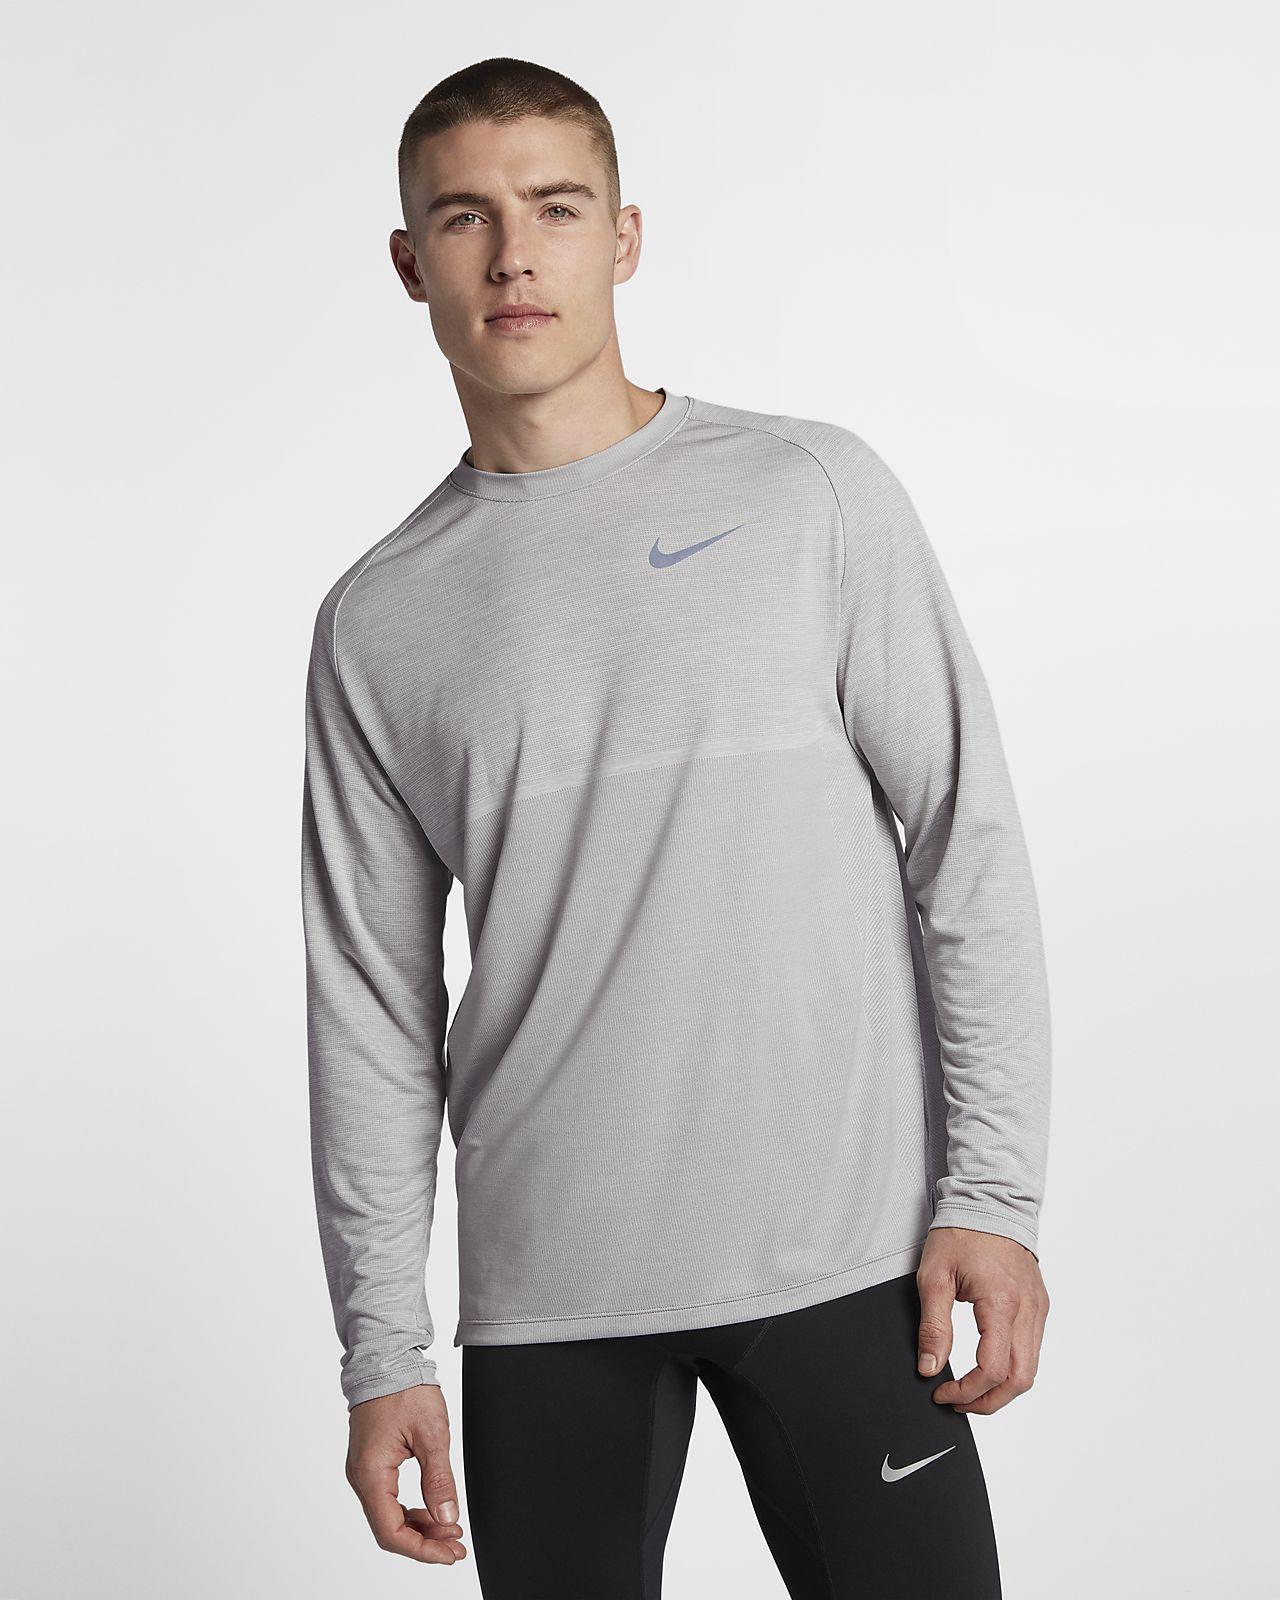 Nike Dri-FIT Medalist Men's Long Sleeve